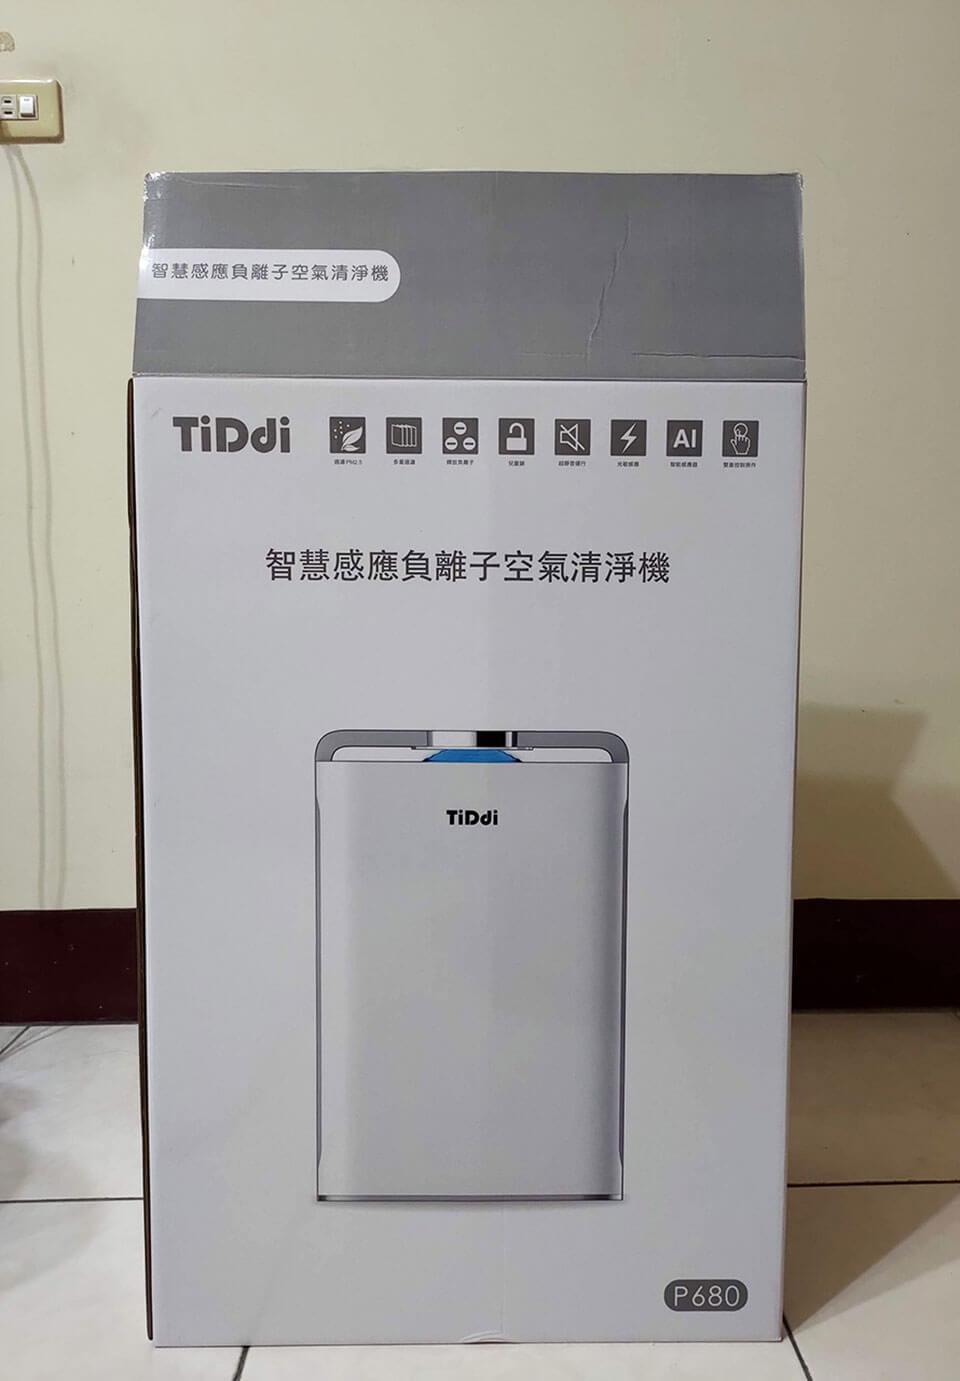 TiDdi空氣清淨機 P680內箱